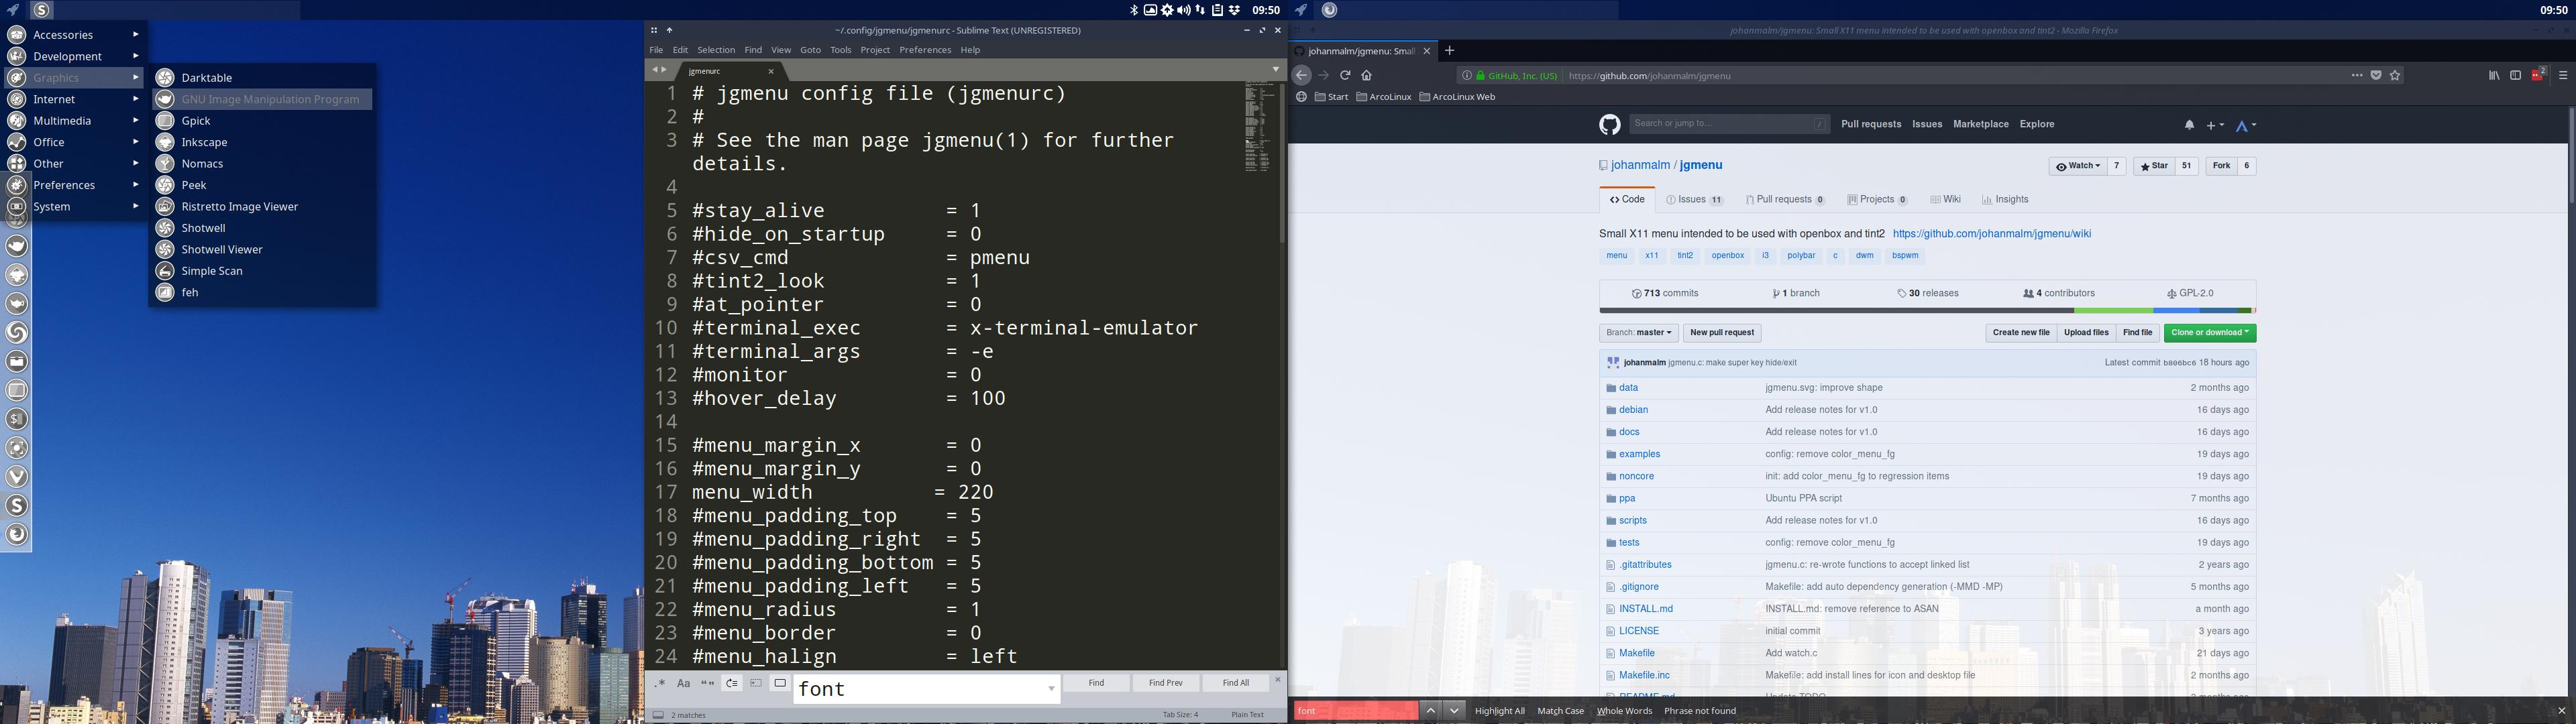 Adding jgmenu to your openbox system   Arcolinux com